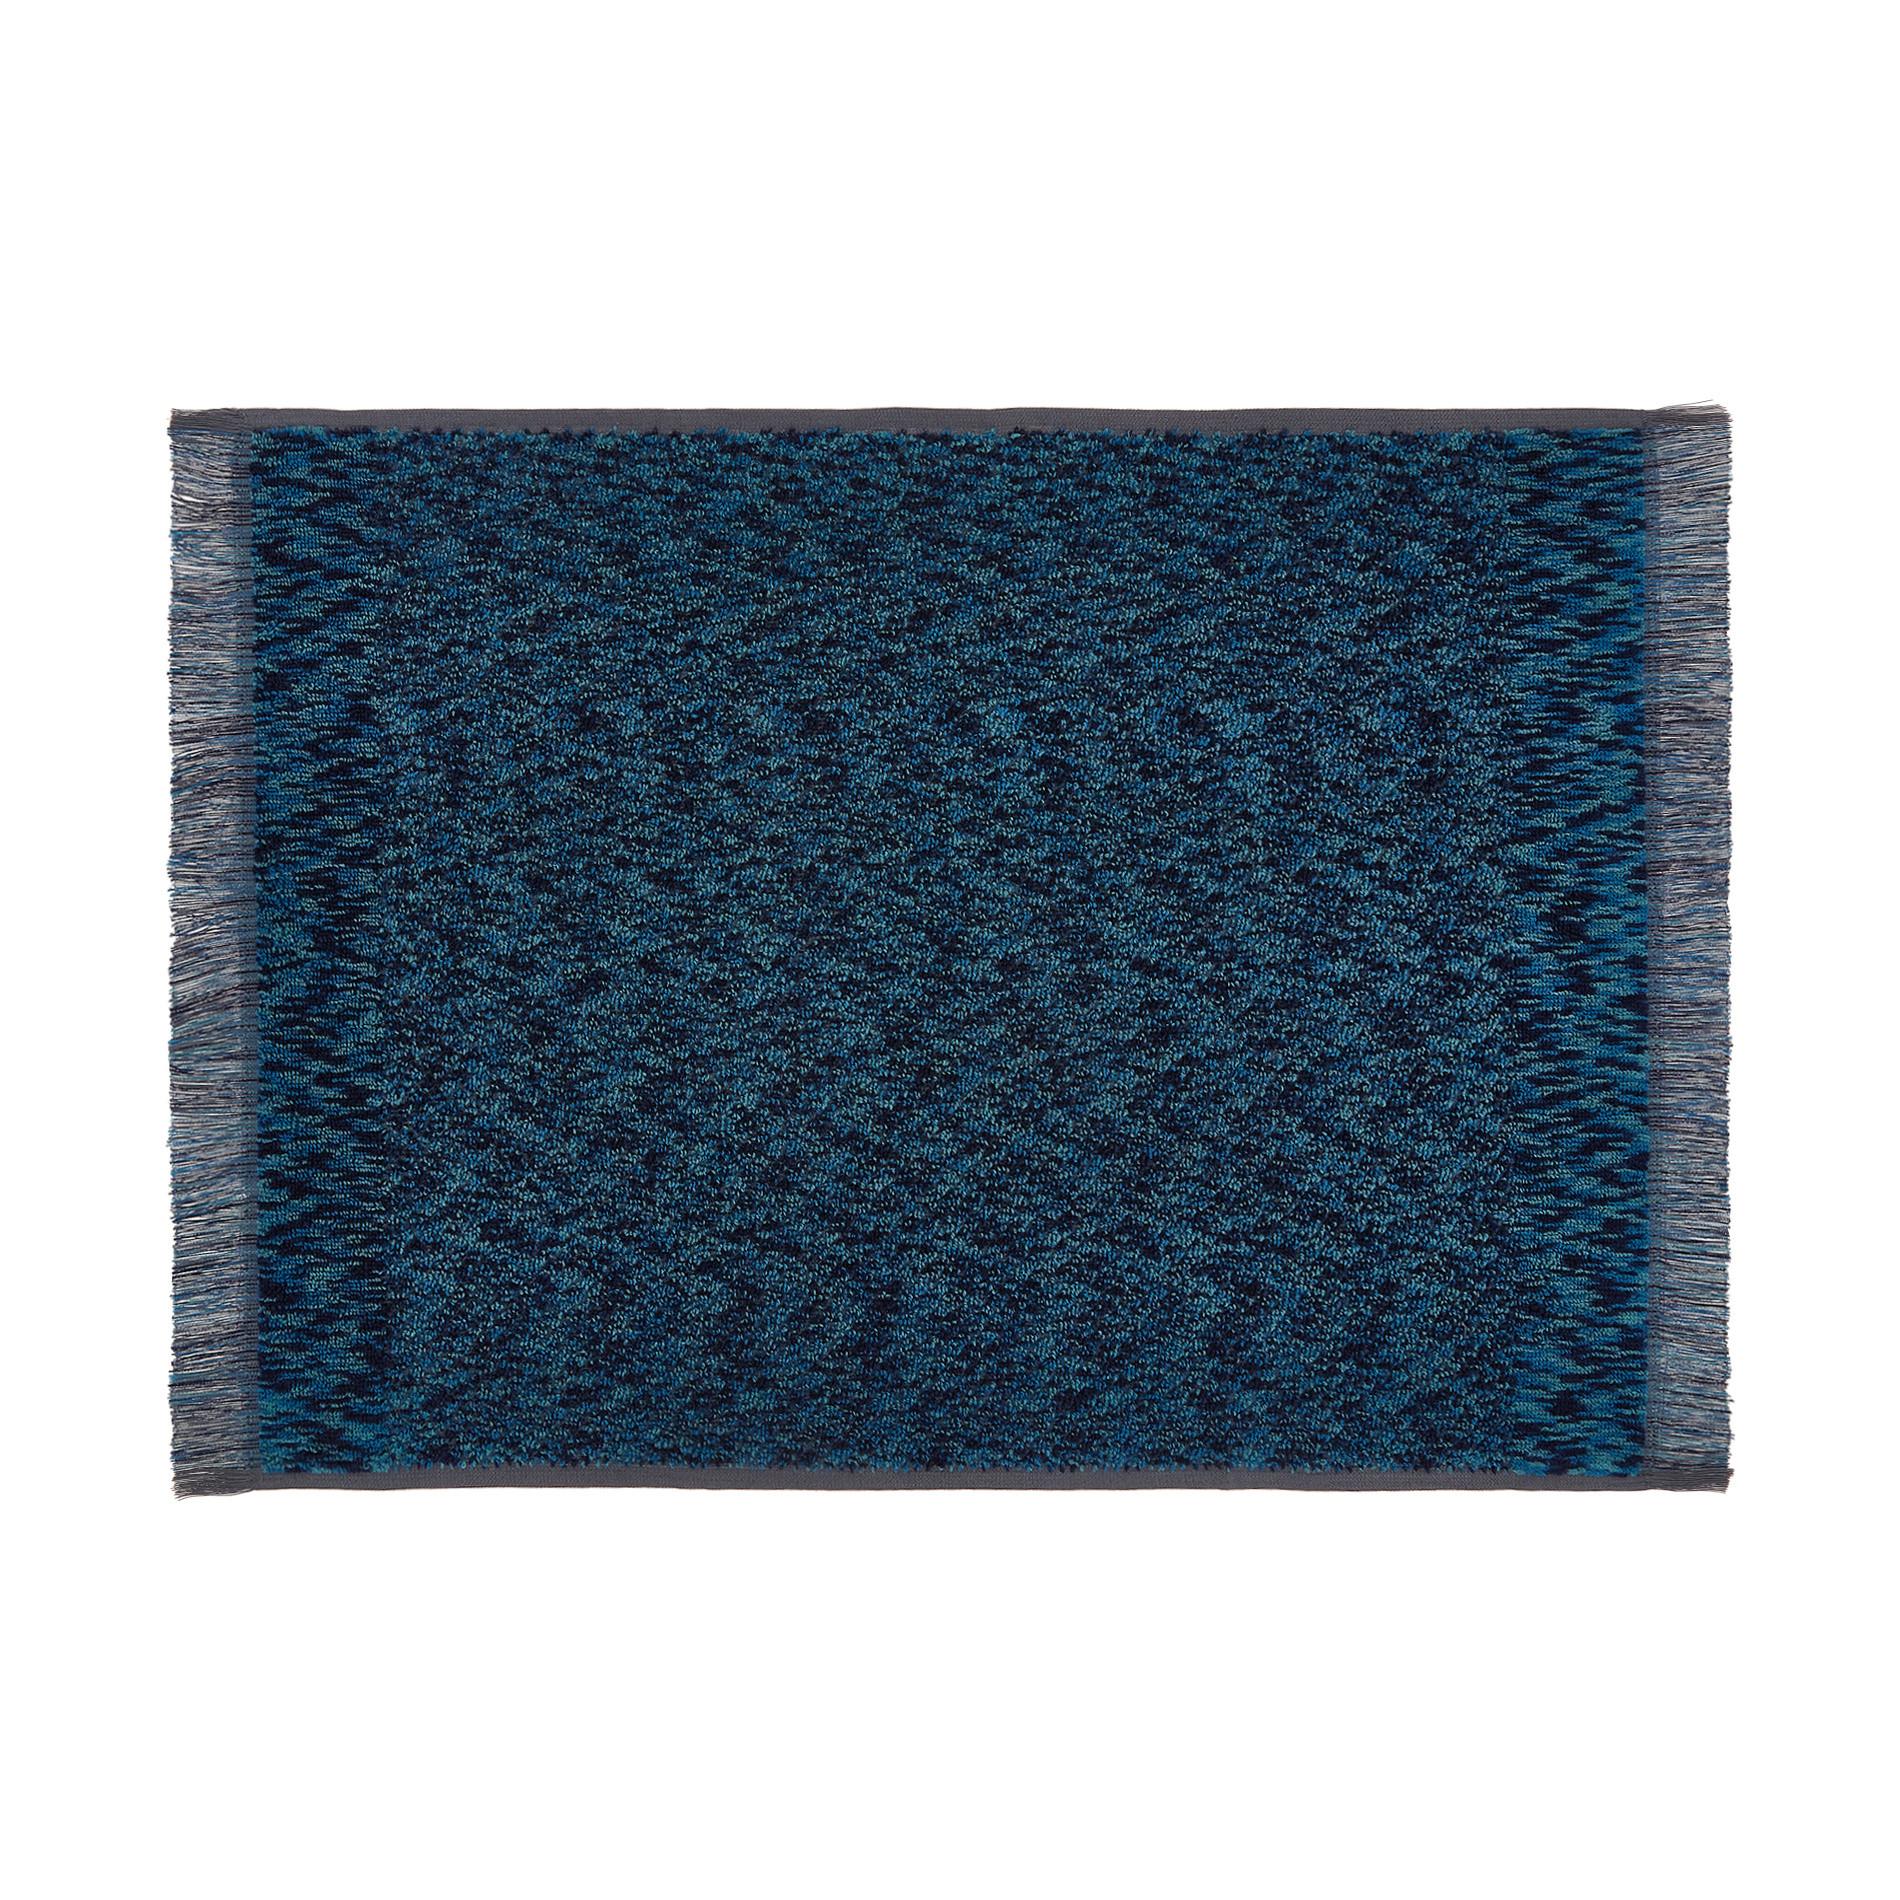 Asciugamano spugna di cotone effetto melange, Blu, large image number 1